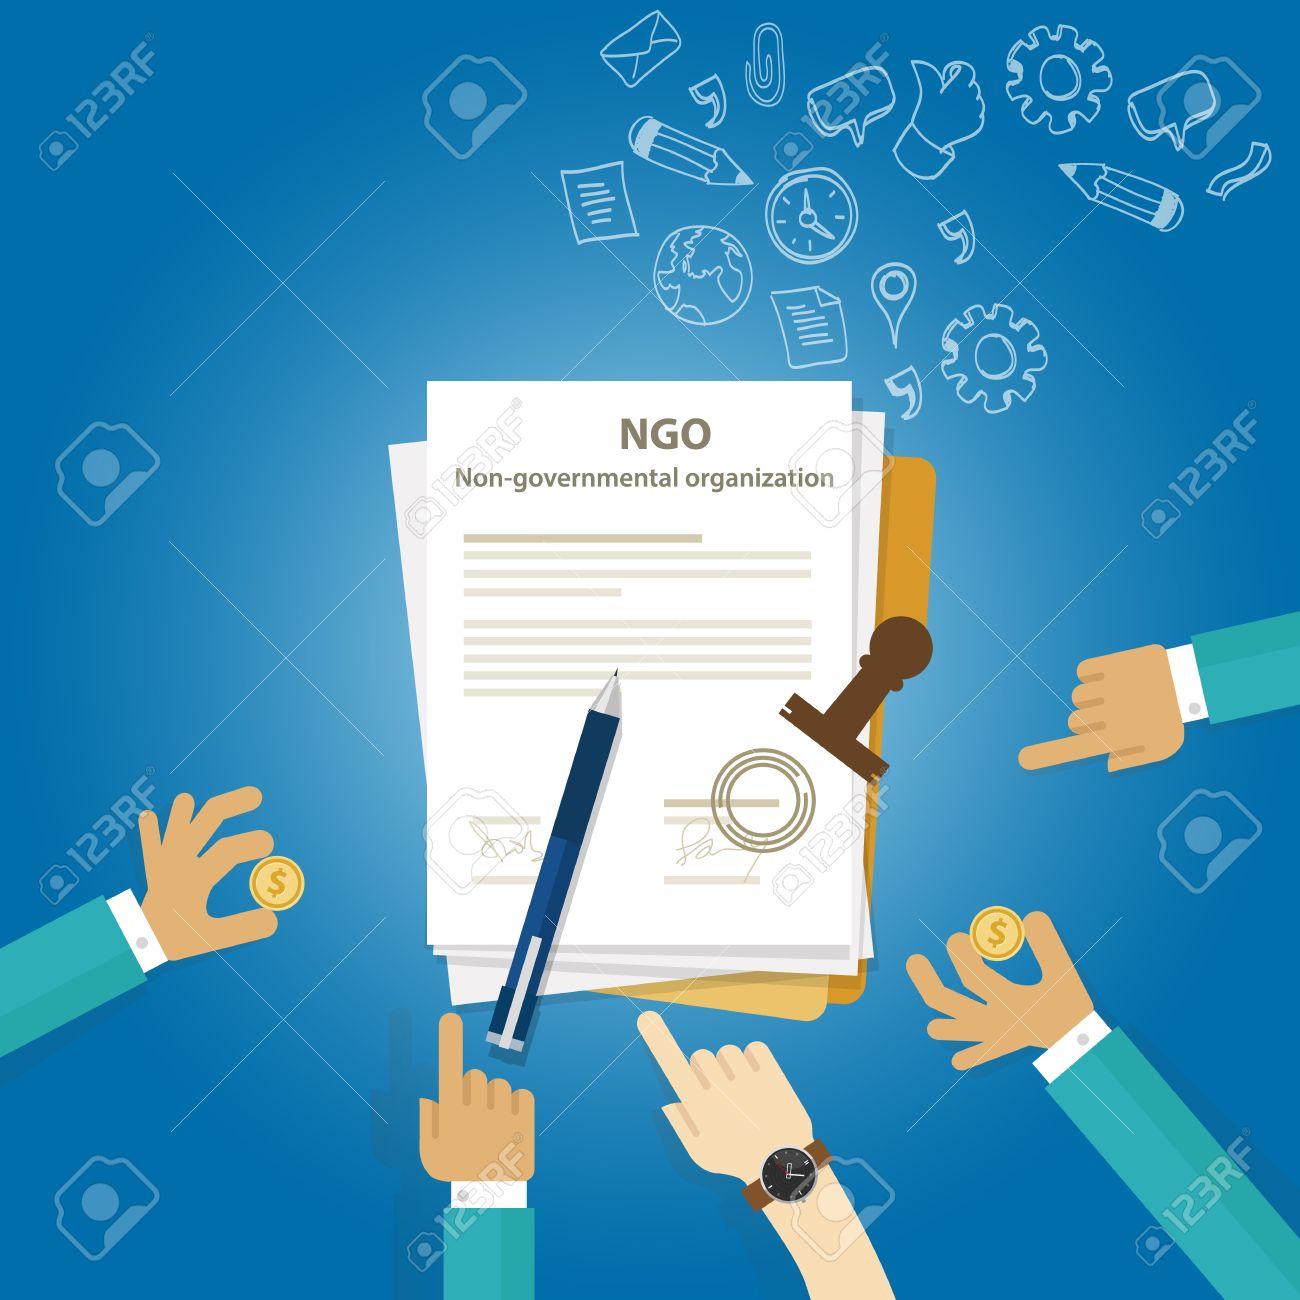 ngo non government organization types of business corporation ngo non government organization types of business corporation organization entity stock vector 53969359